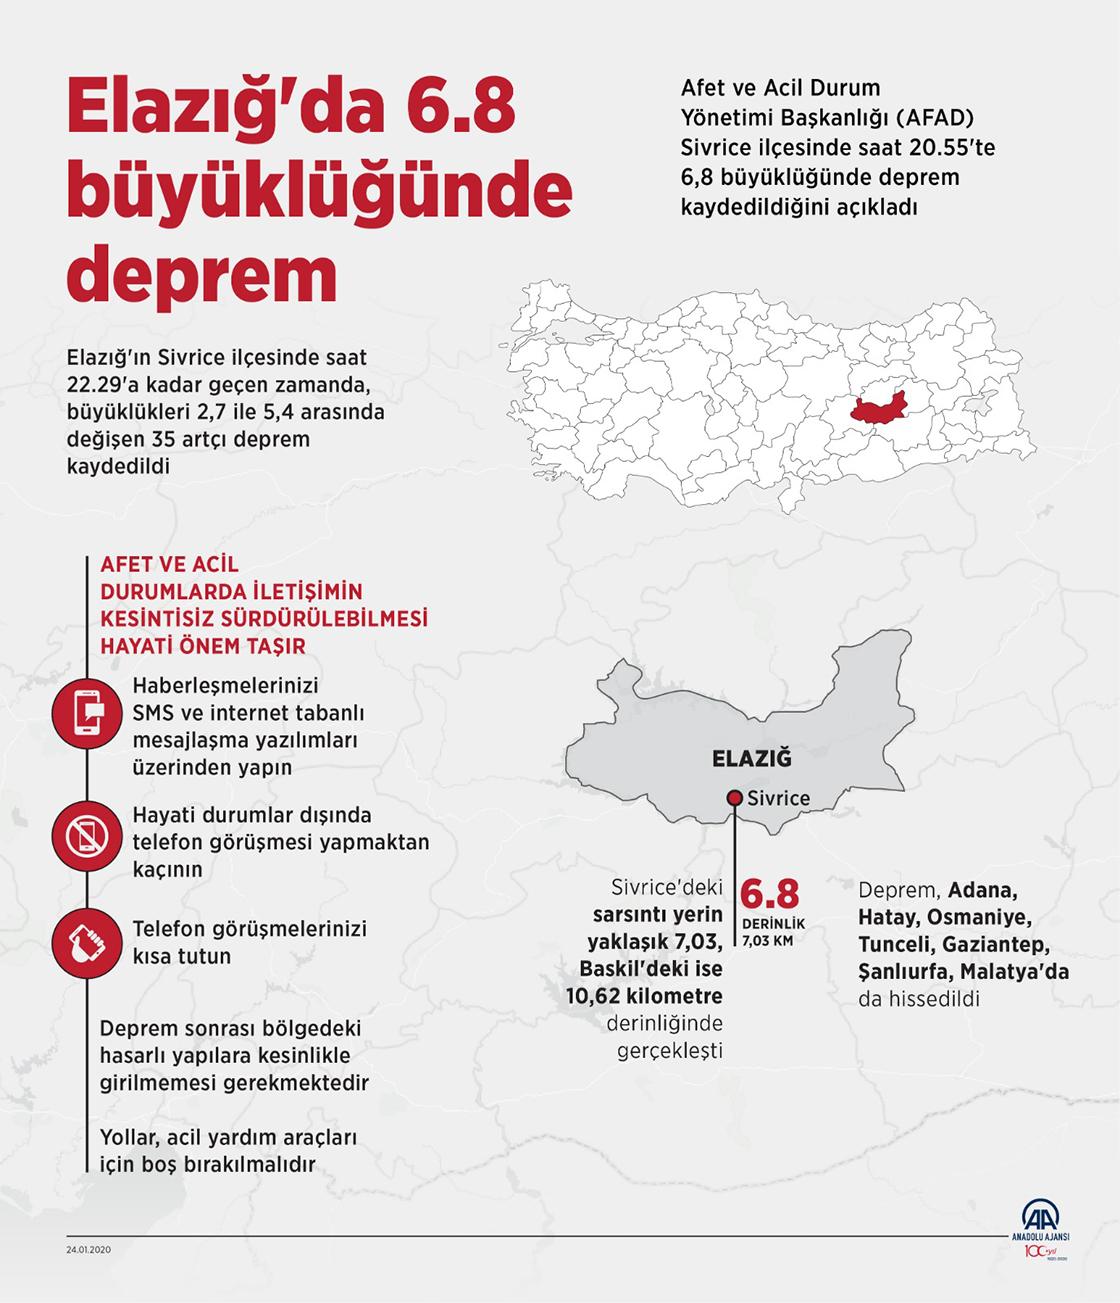 mehmet-ayduran-grafik-elazig-deprem-info.jpg